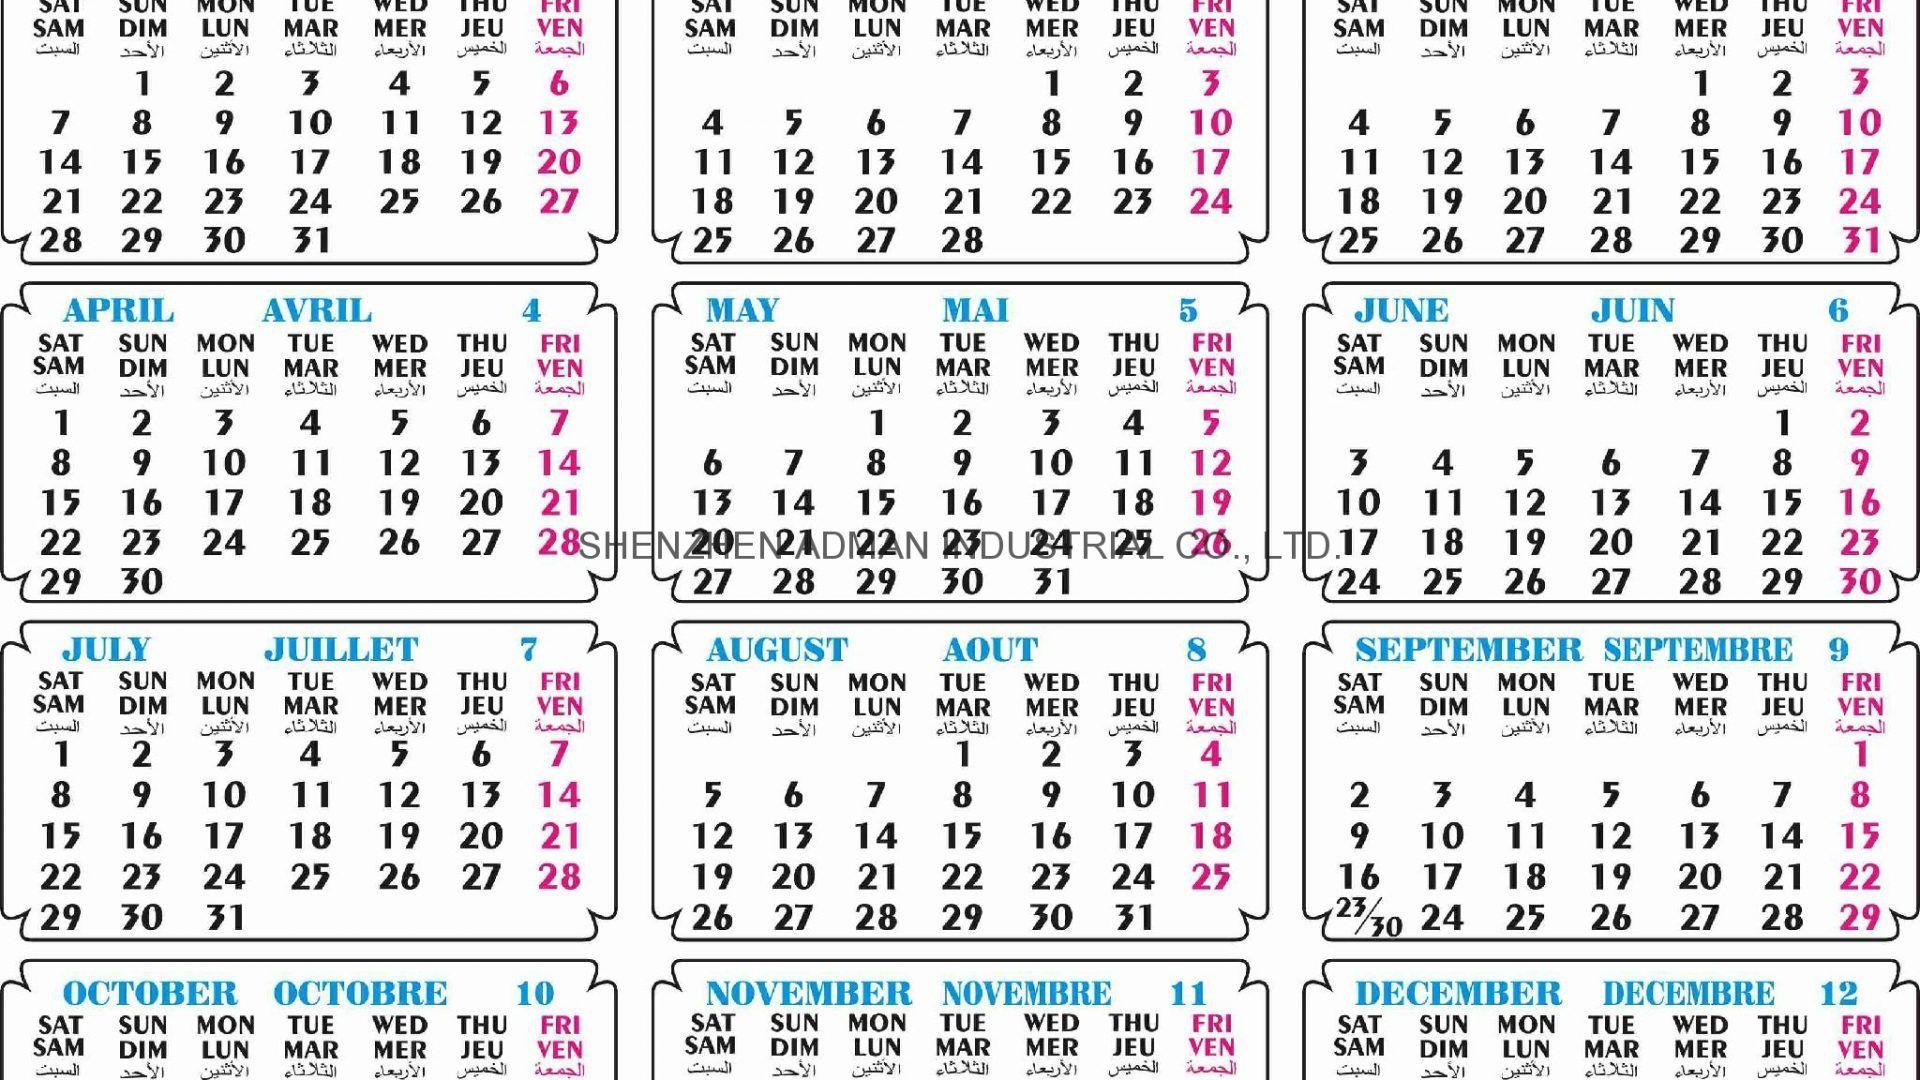 March Calendar Wallpaper Calendar And Images 1920 1080 March Calendar Wallpaper 2017 26 Wallpape Islamic Calendar Calendar Wallpaper 2017 Calendar Wallpaper